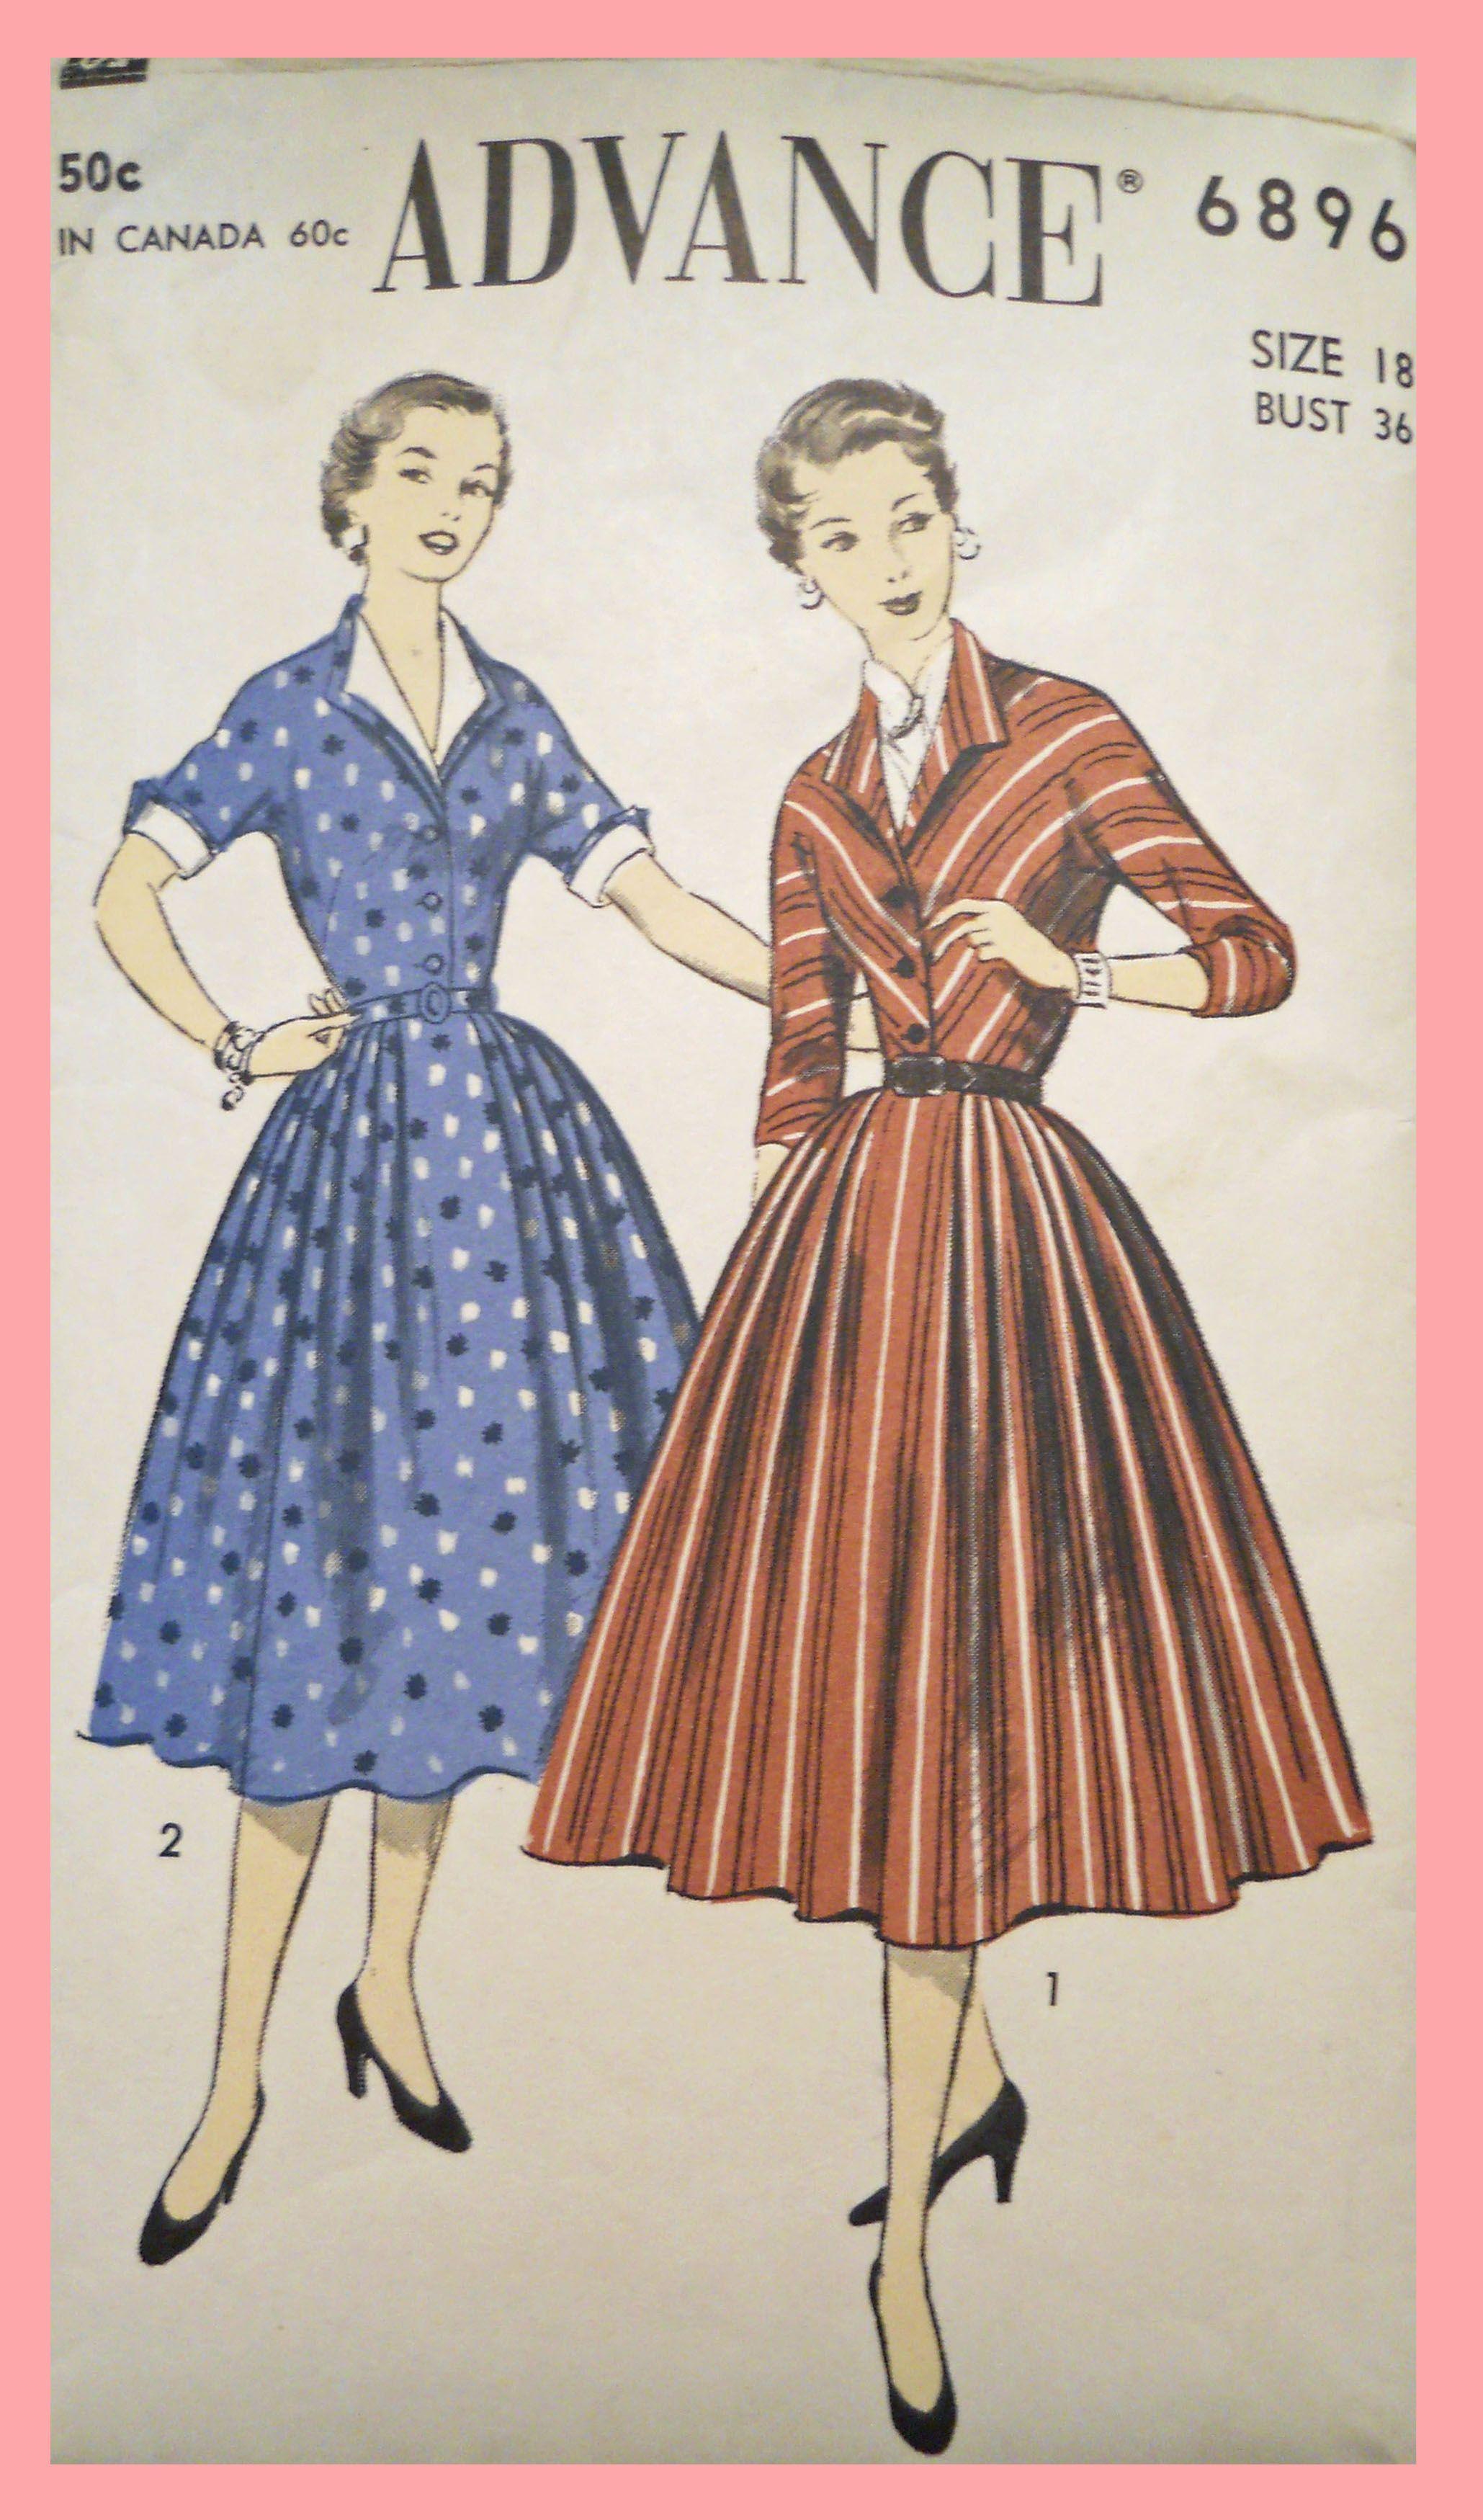 1950s dress patterns - Google Search | 1950s patterns | Pinterest